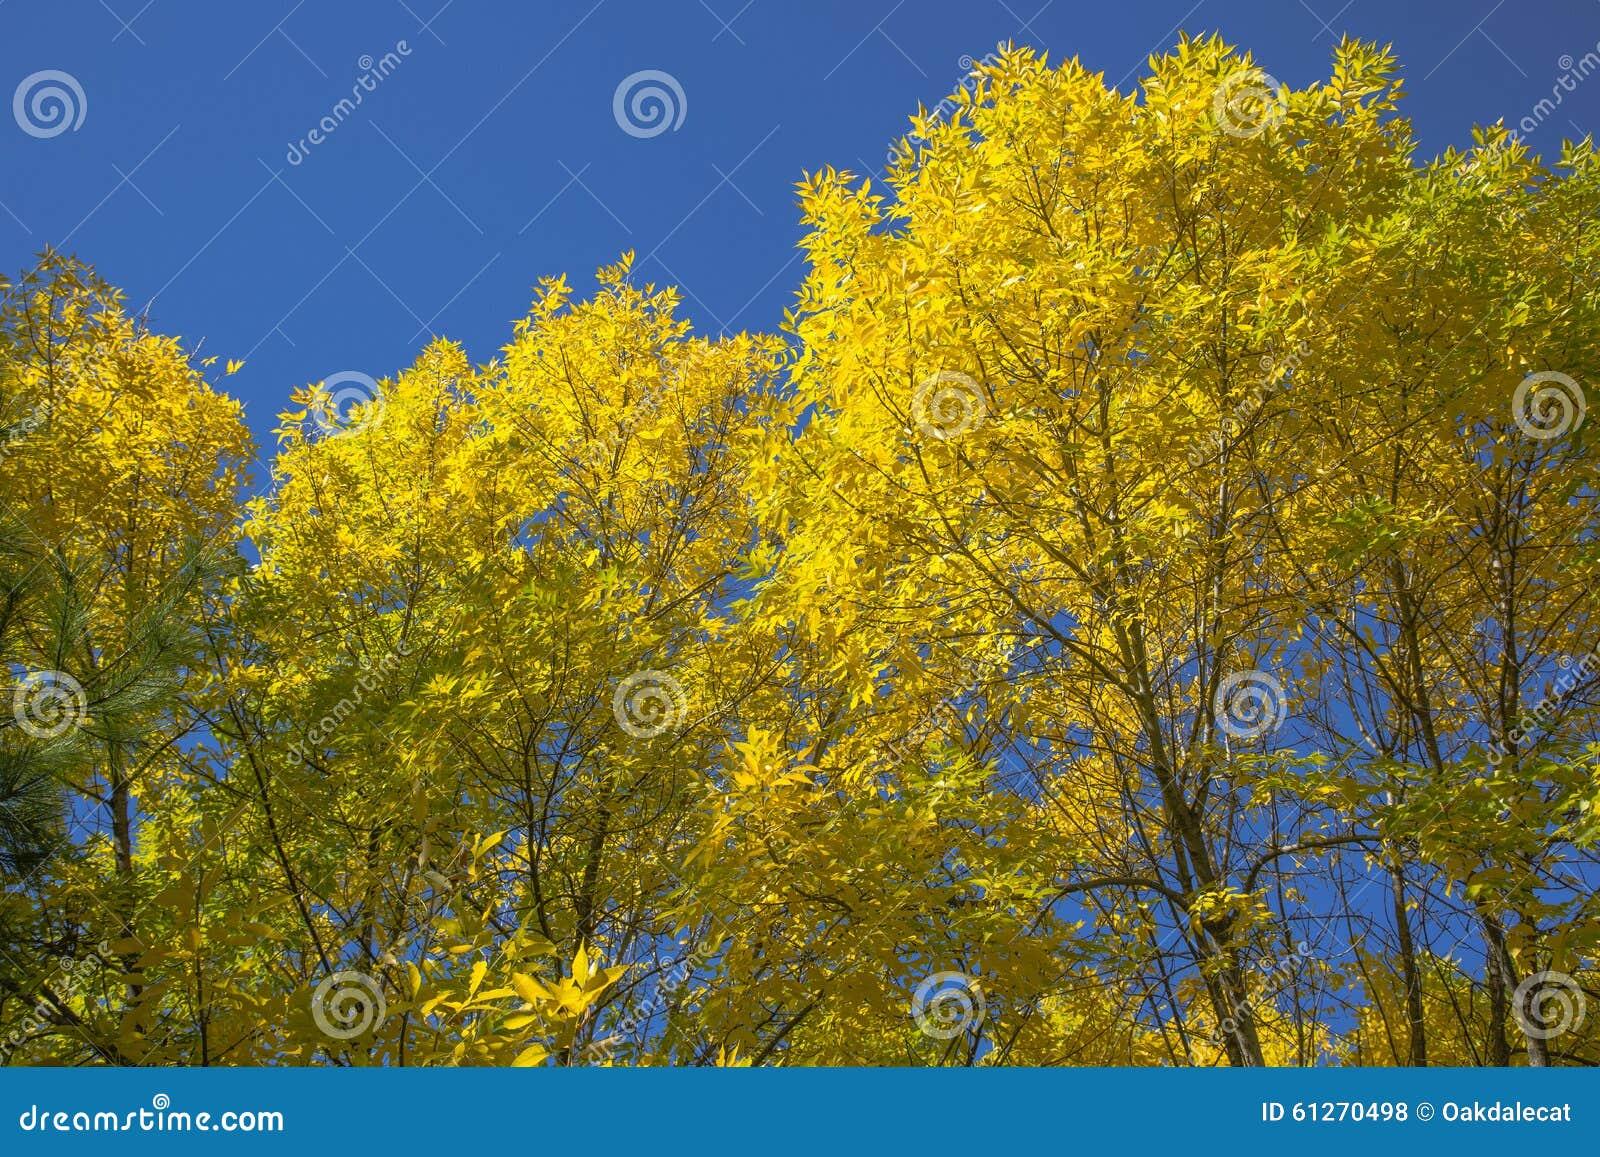 Yellow Fall Elm Trees, Blue Sky